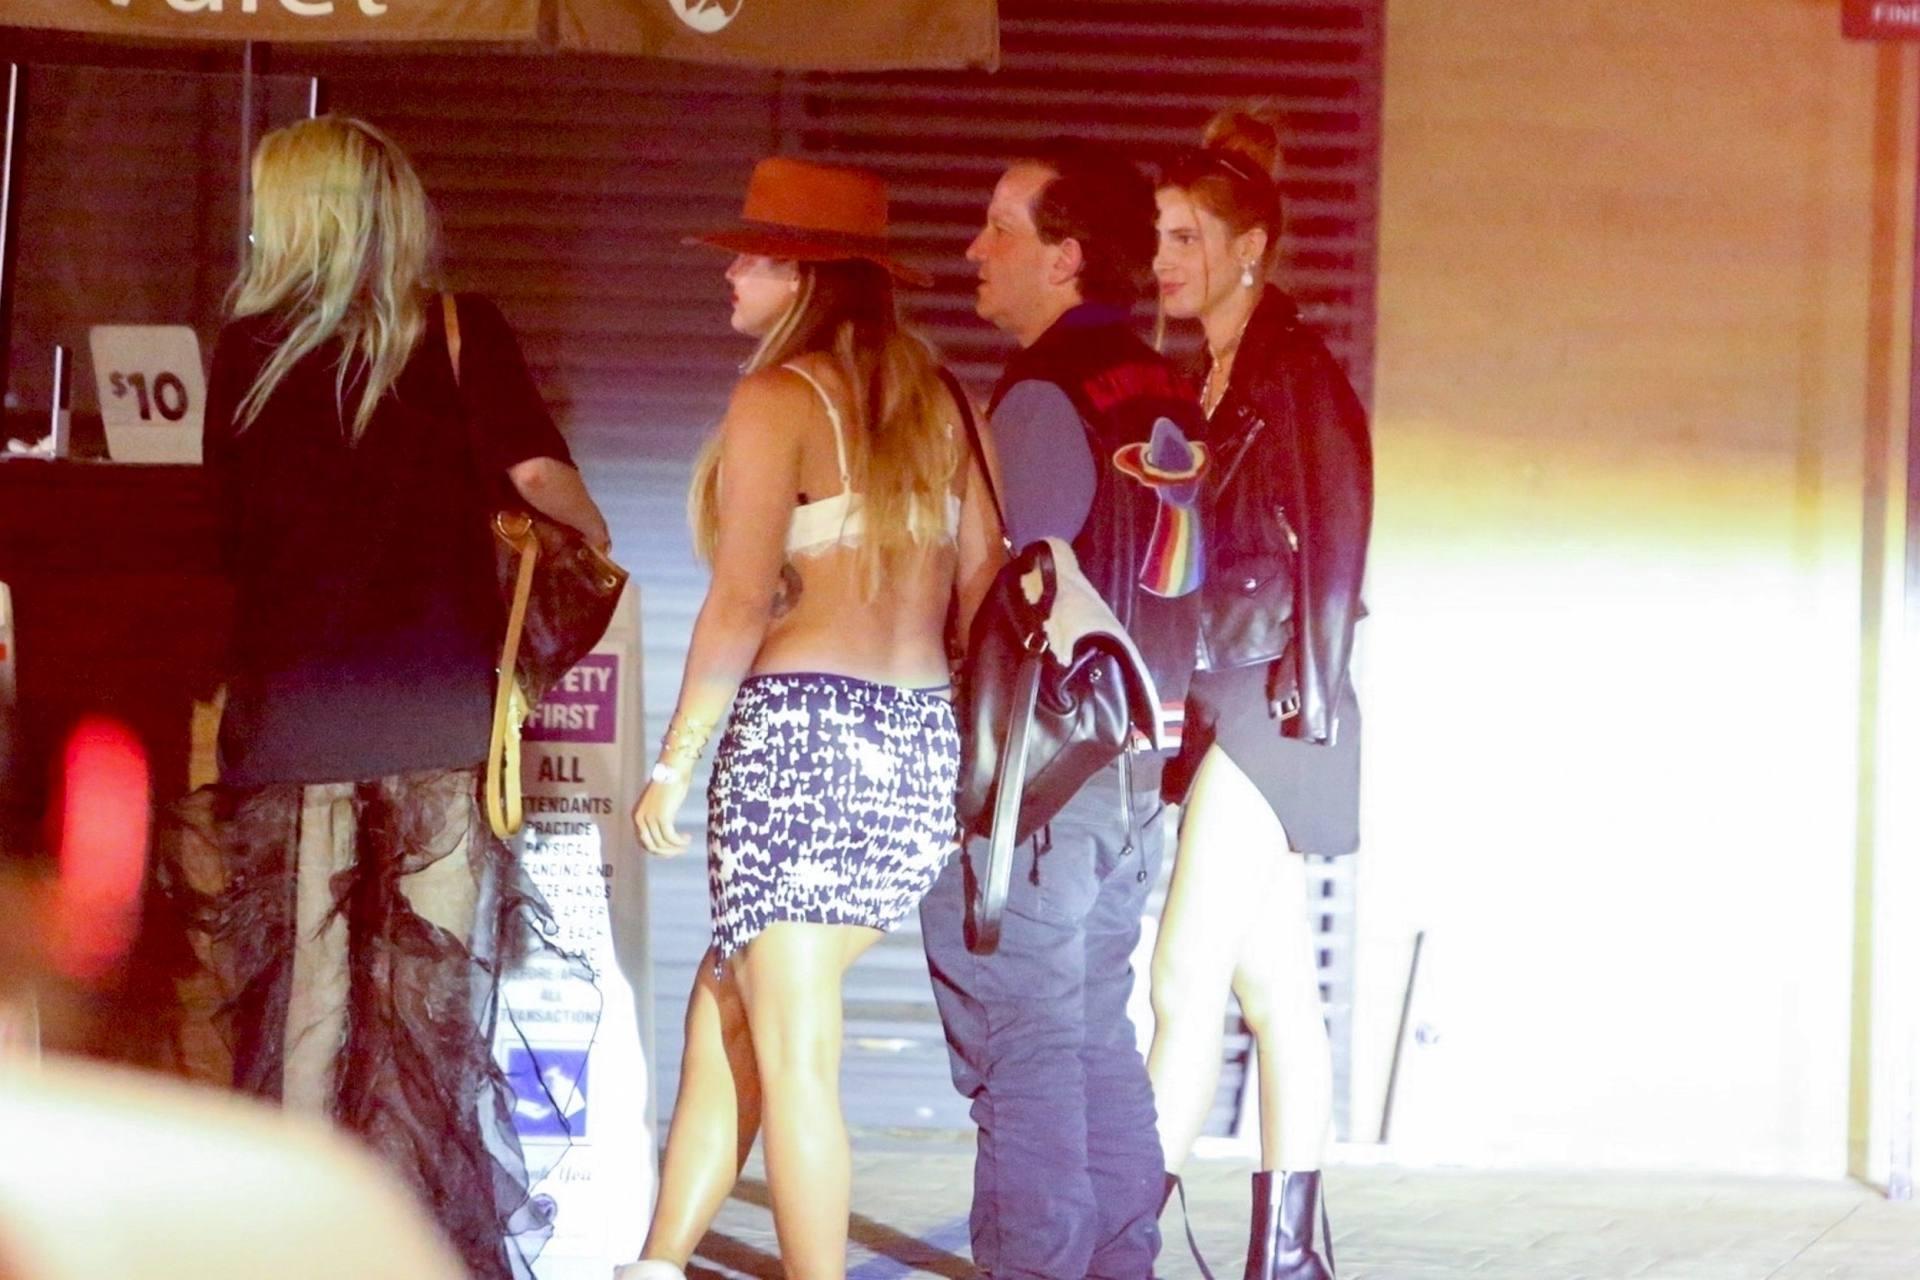 Bella & Dani Thorne – Sexy Legs In Mini Skirts At Nobu In Malibu 0022